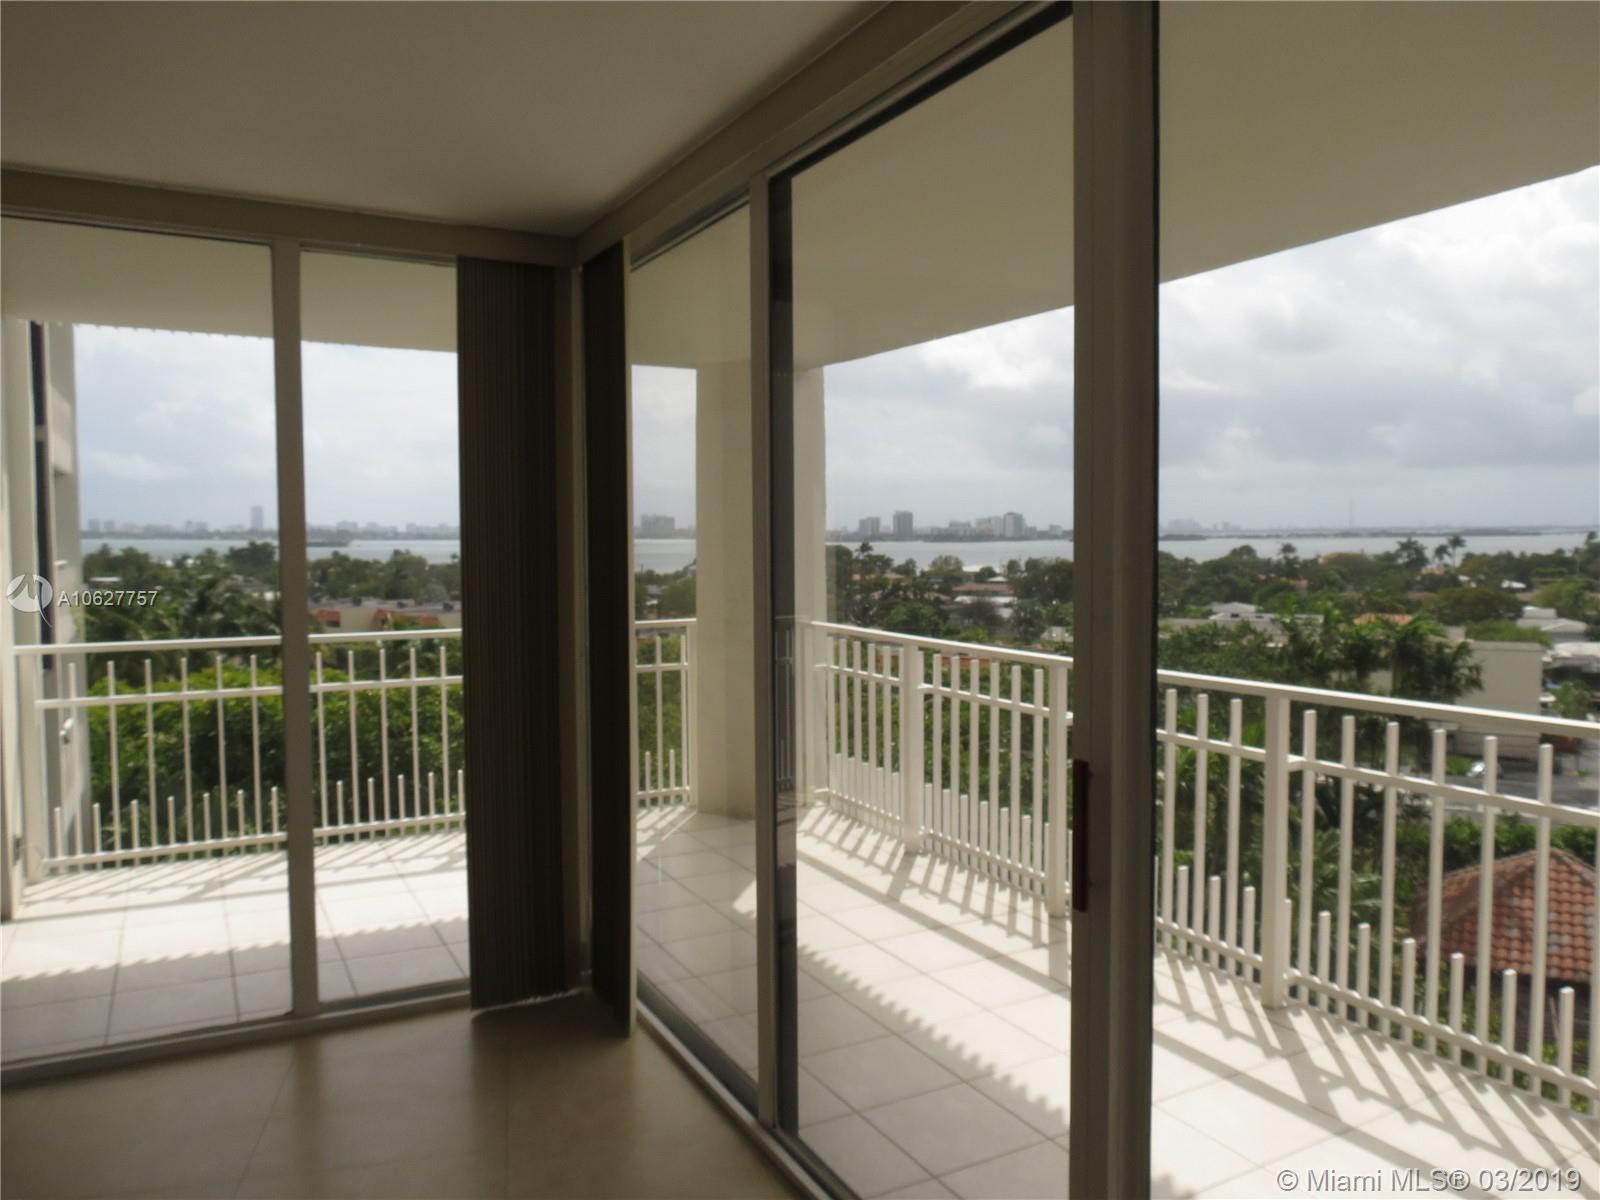 2000 Towerside Ter, 810 - Miami, Florida